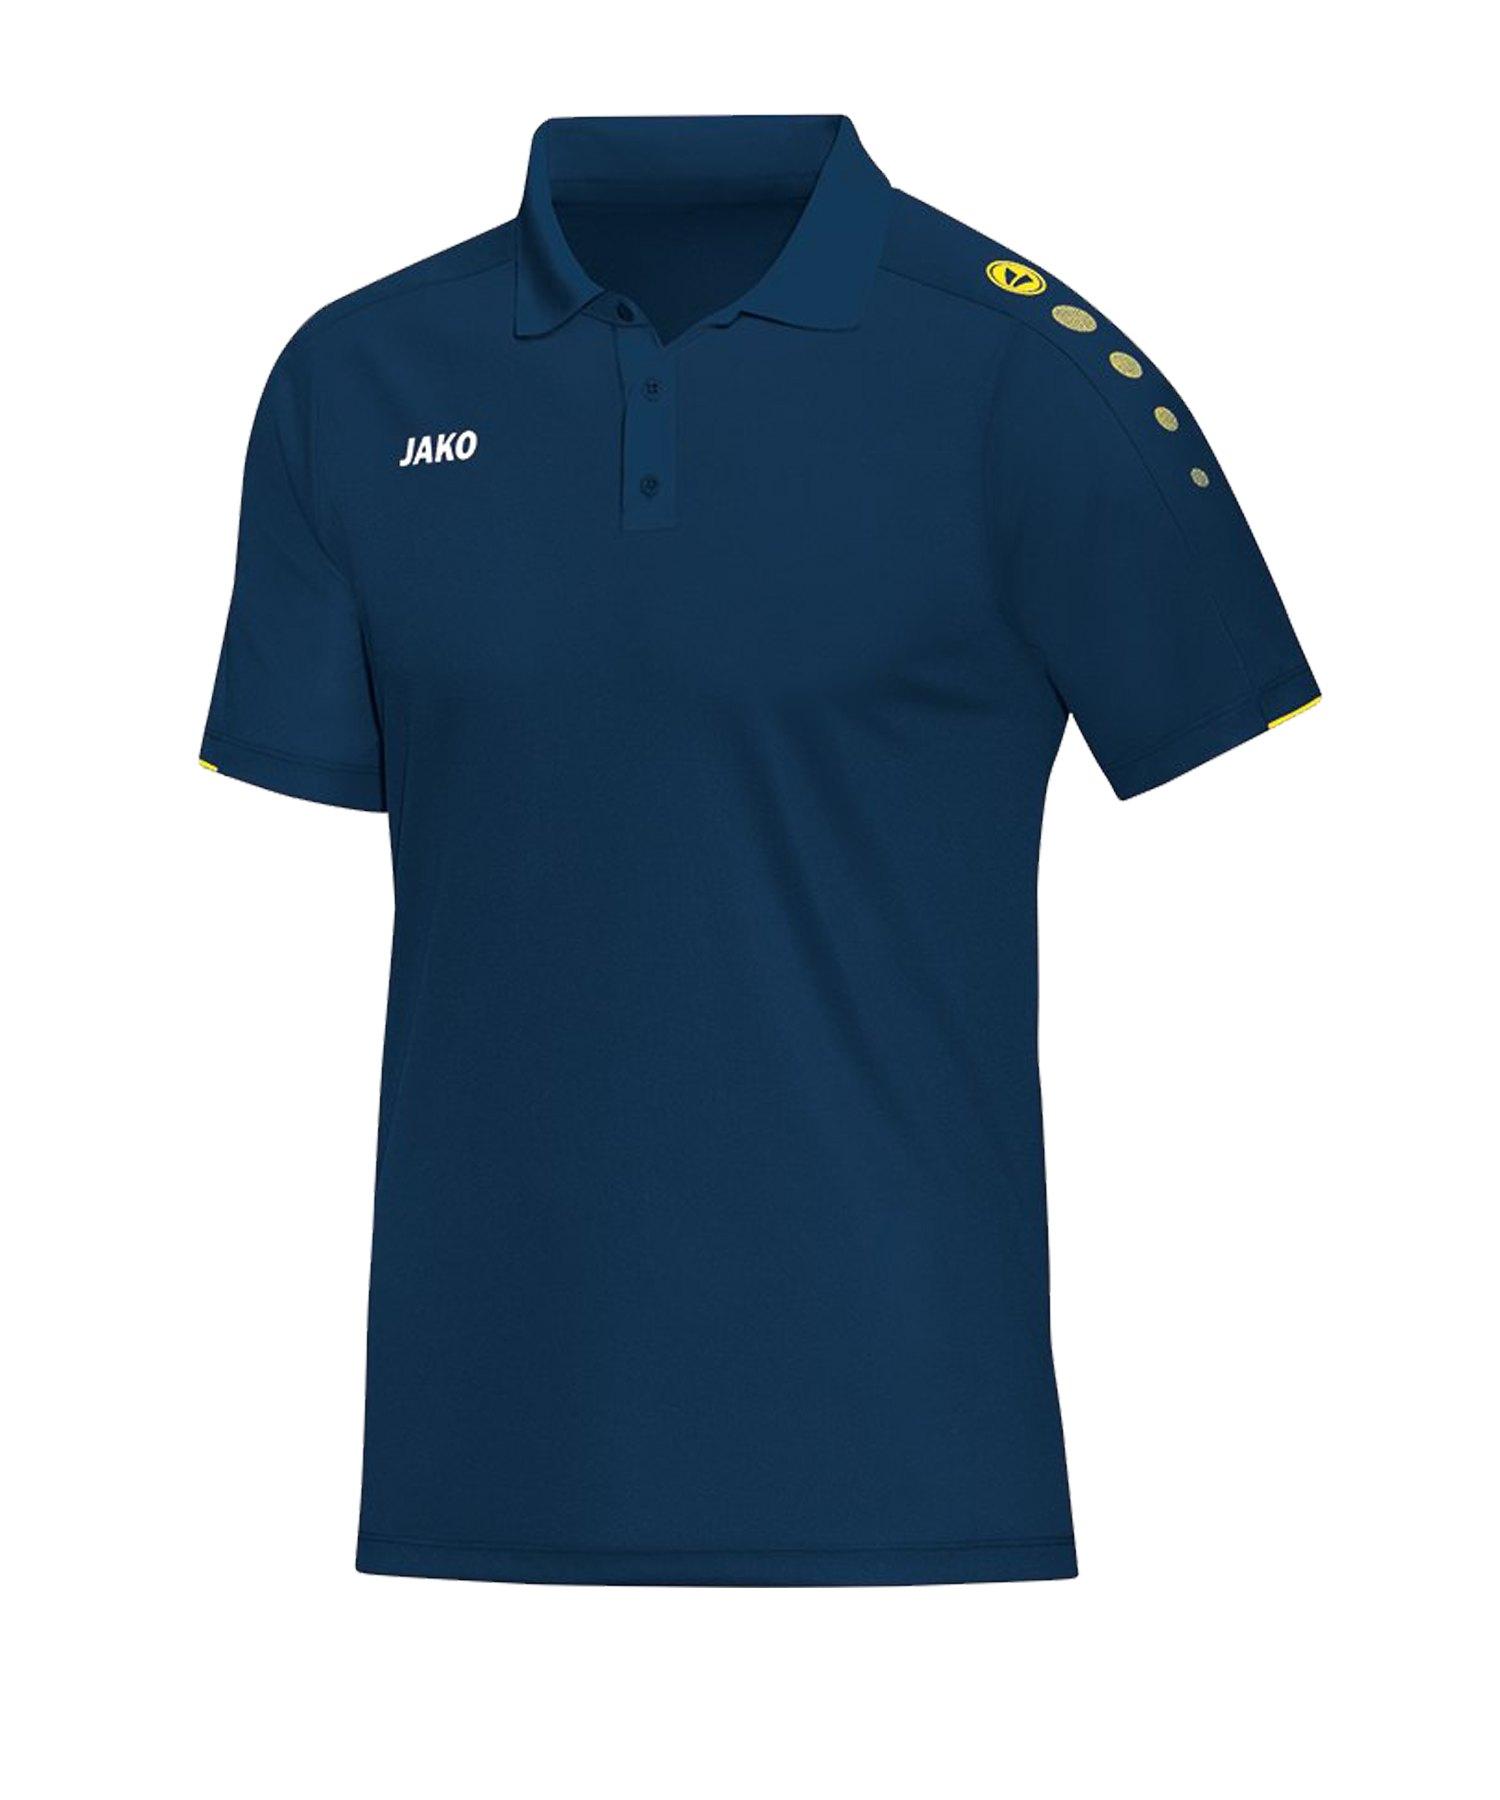 Jako Classico Poloshirt Kids Blau Gelb F42 - Blau